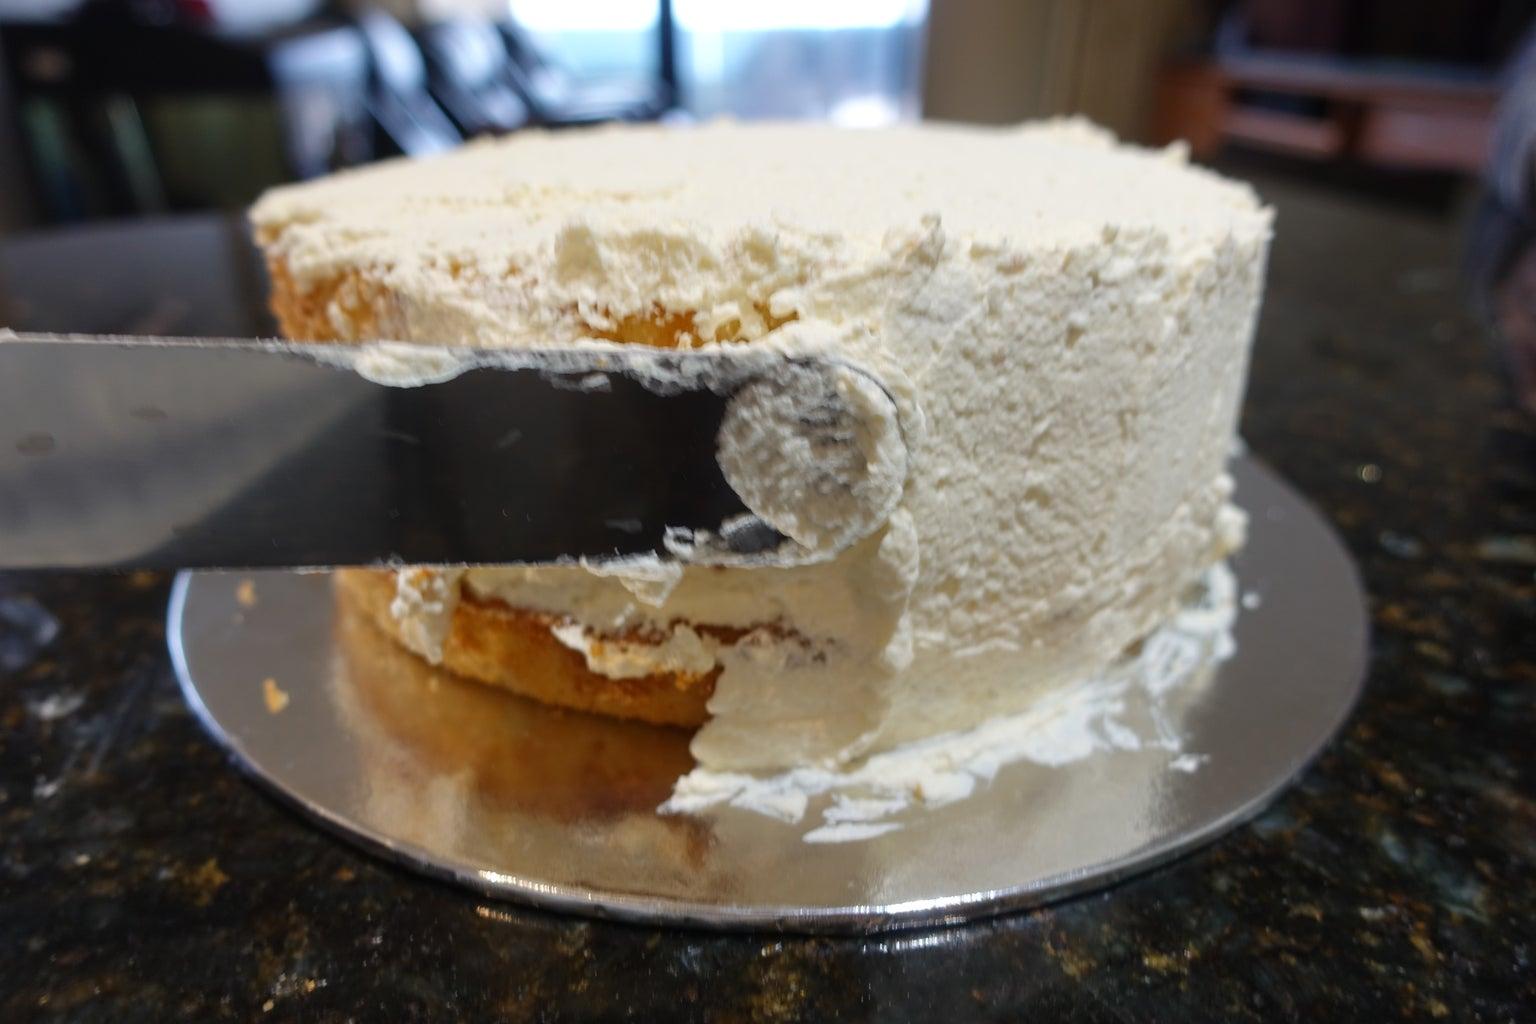 Decorate the Cake